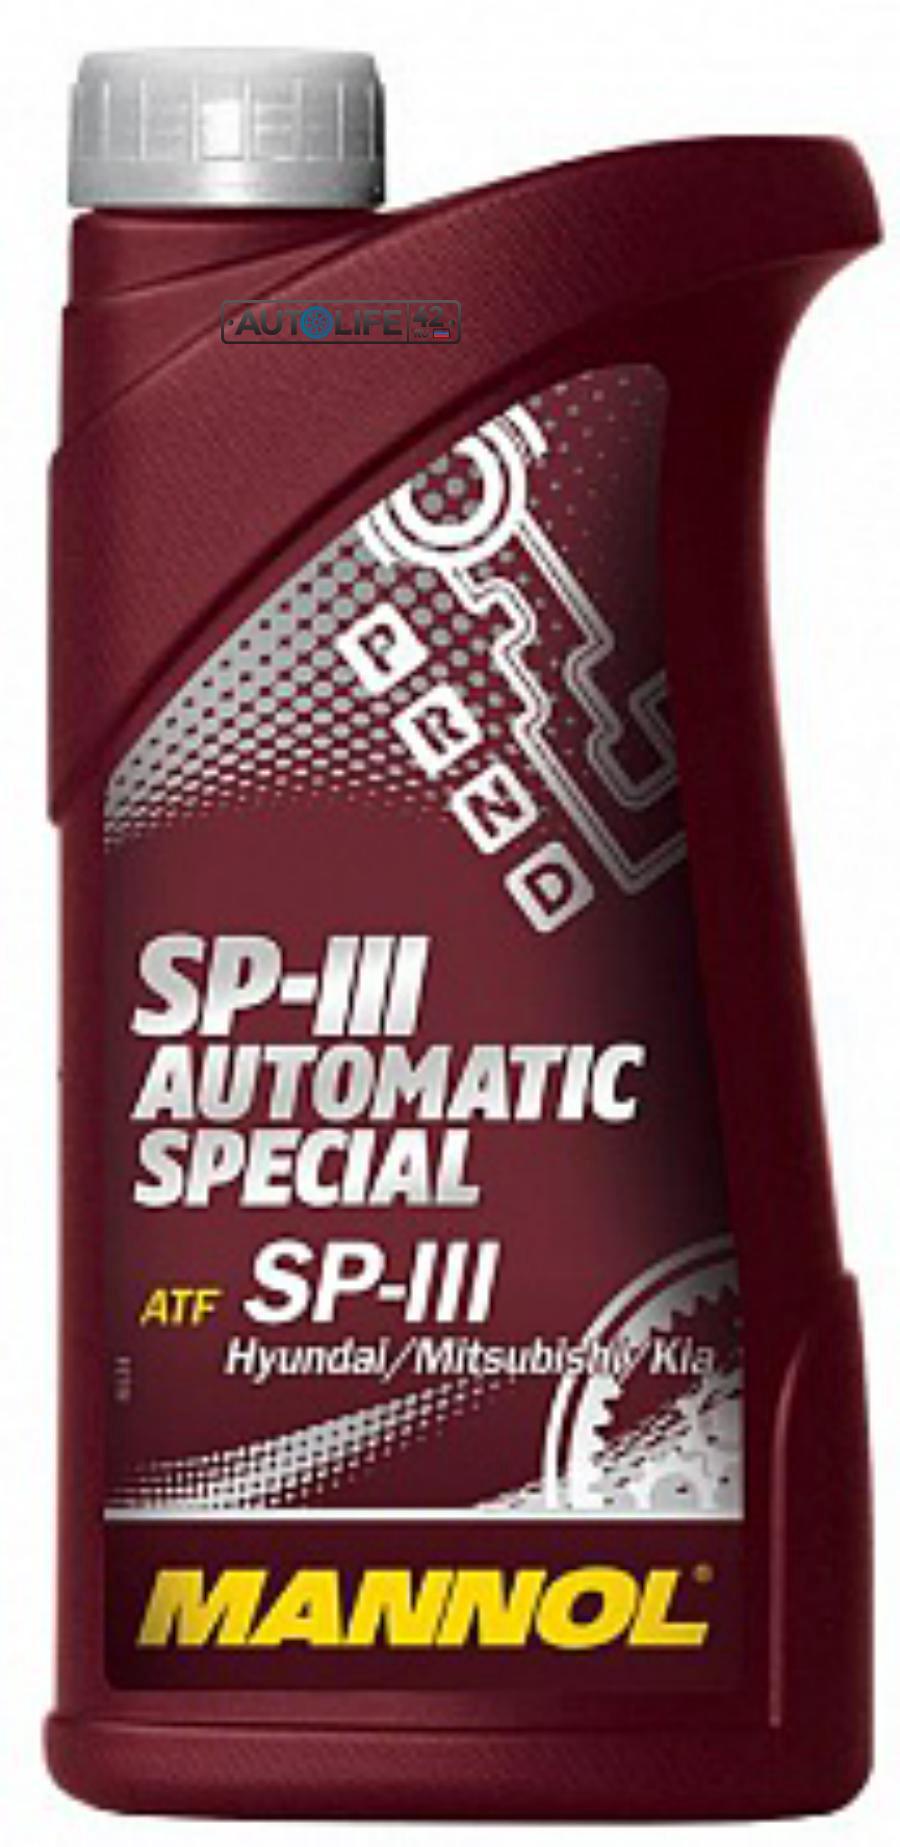 Масло трансмиссионное синтетическое 8209 O,E,M, for Hyunda Kia Mitsubishi ATF SP-III, 1л